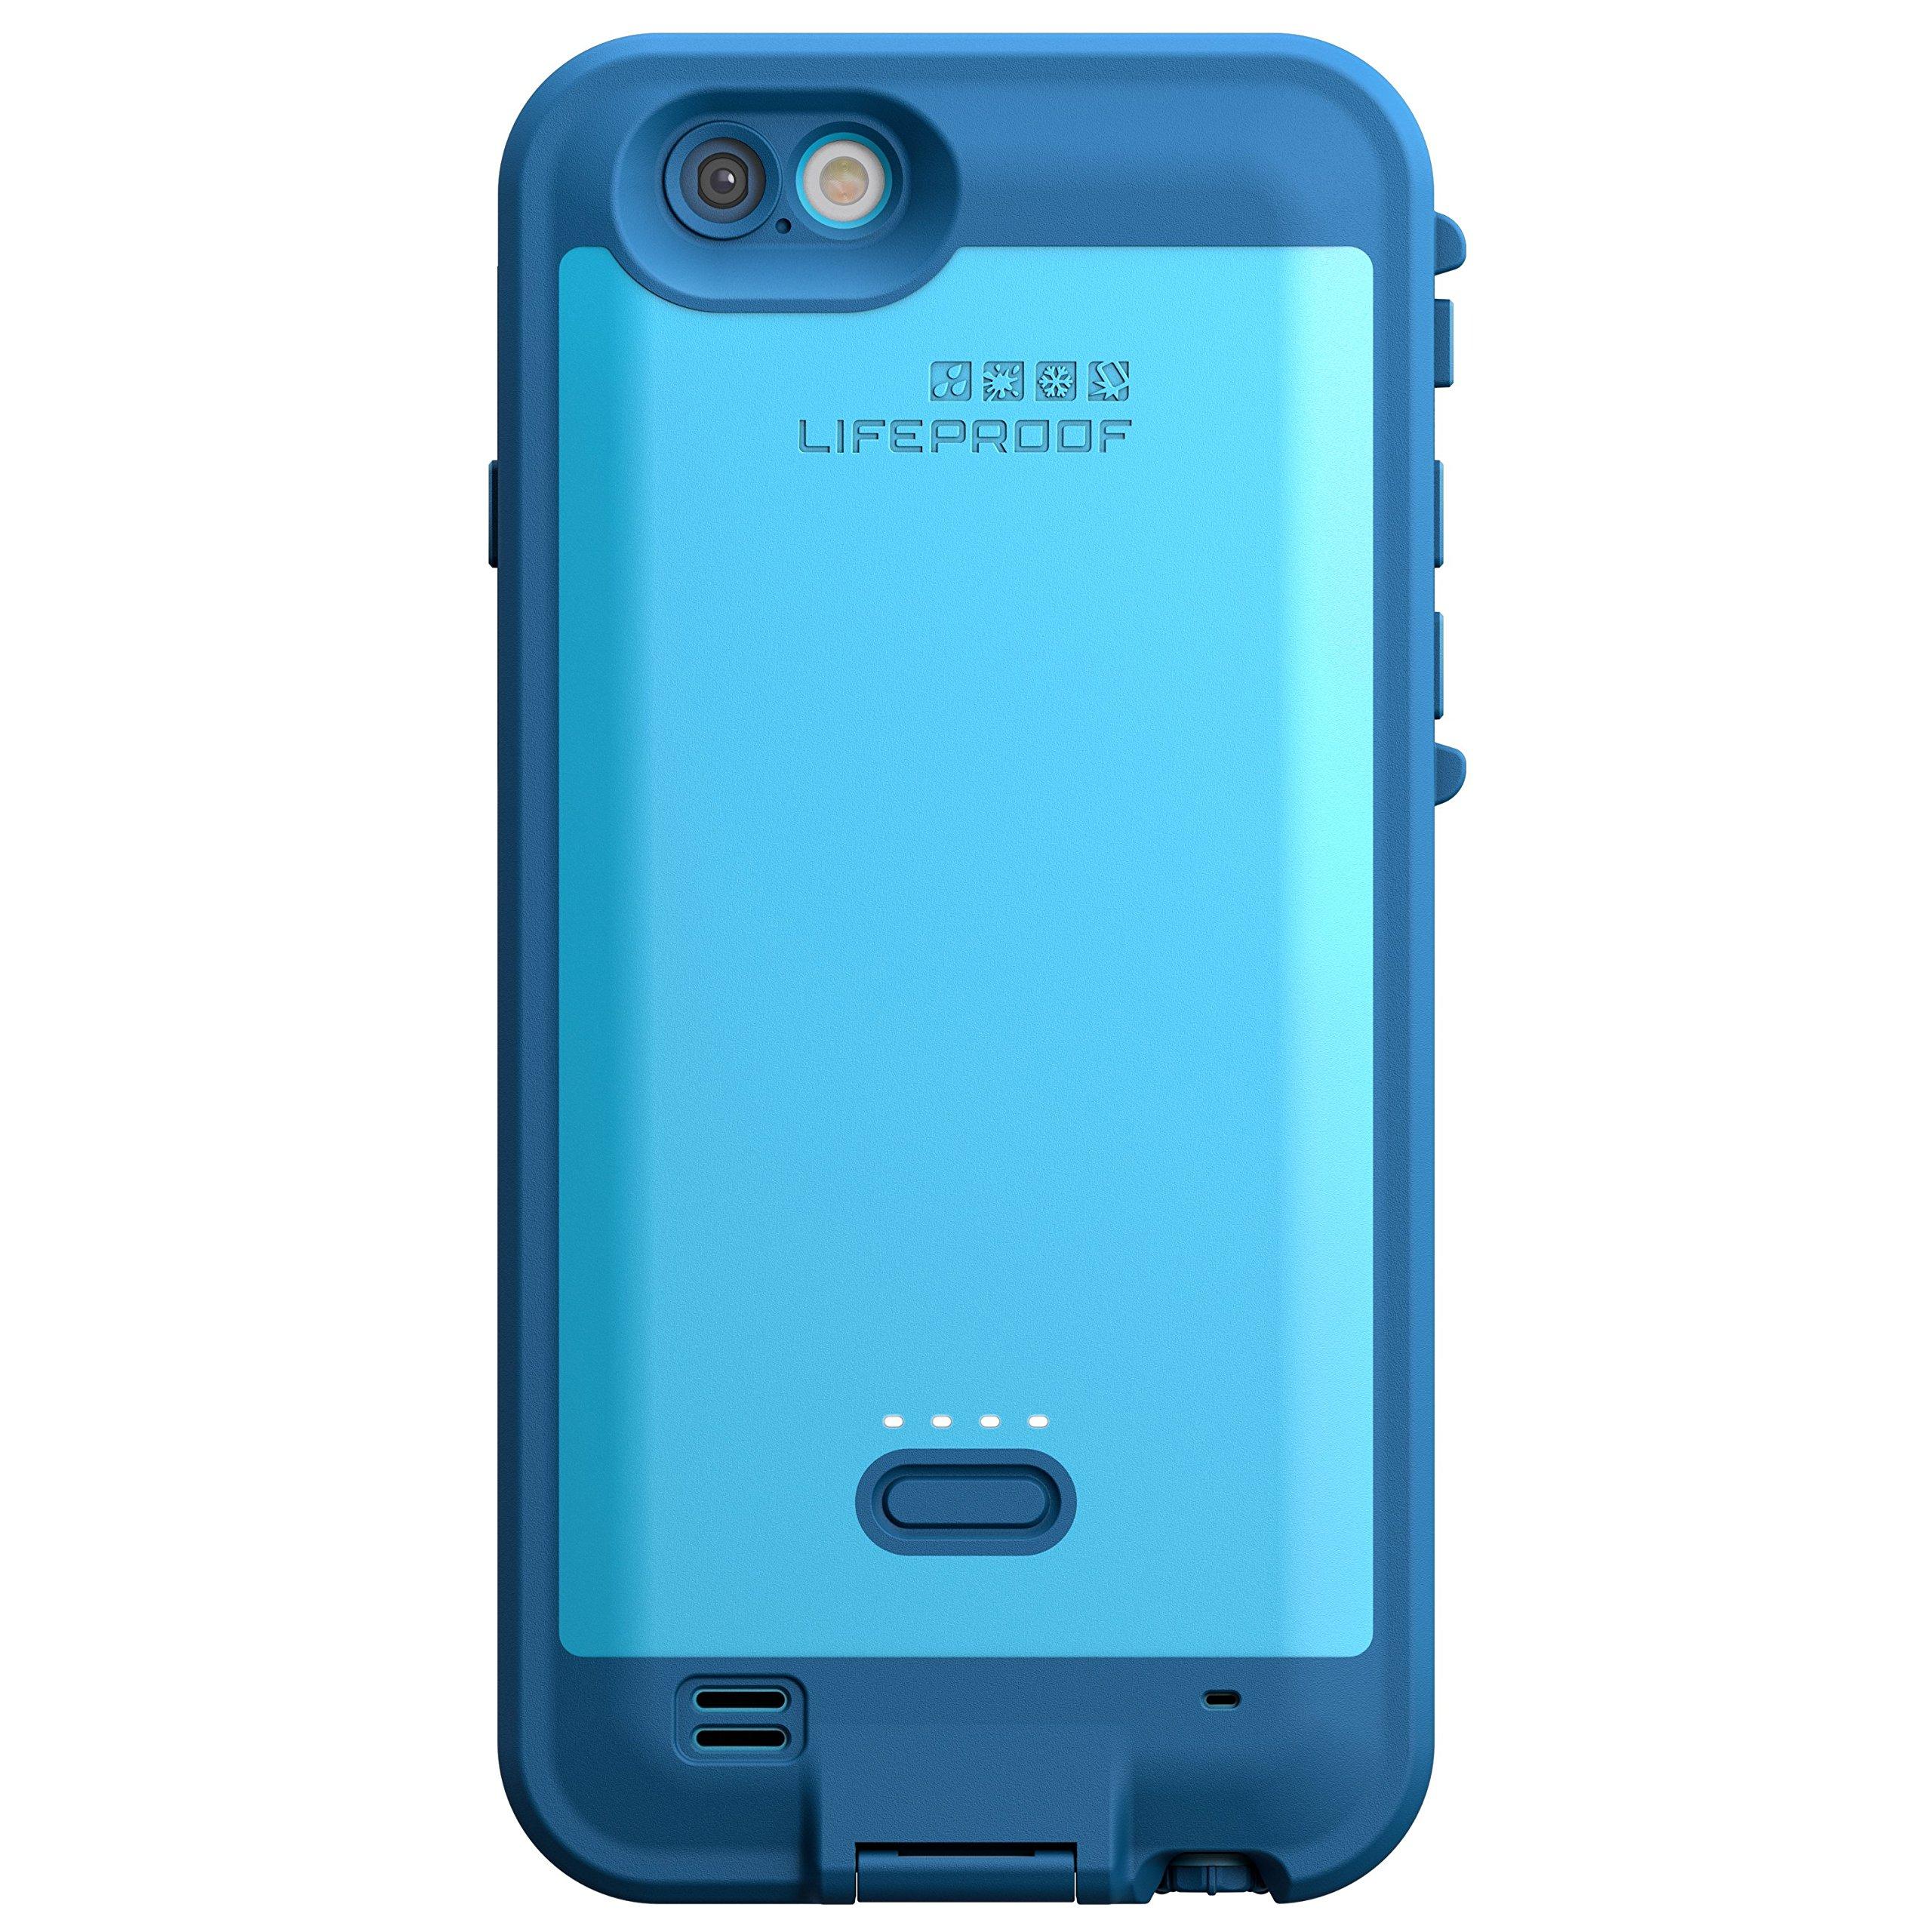 Lifeproof FRE POWER iPhone 6/6s (4.7'' Version) Waterproof Battery Case - Retail Packaging - BASE JUMP BLUE (BASE BLUE/SNOWCONE BLUE)